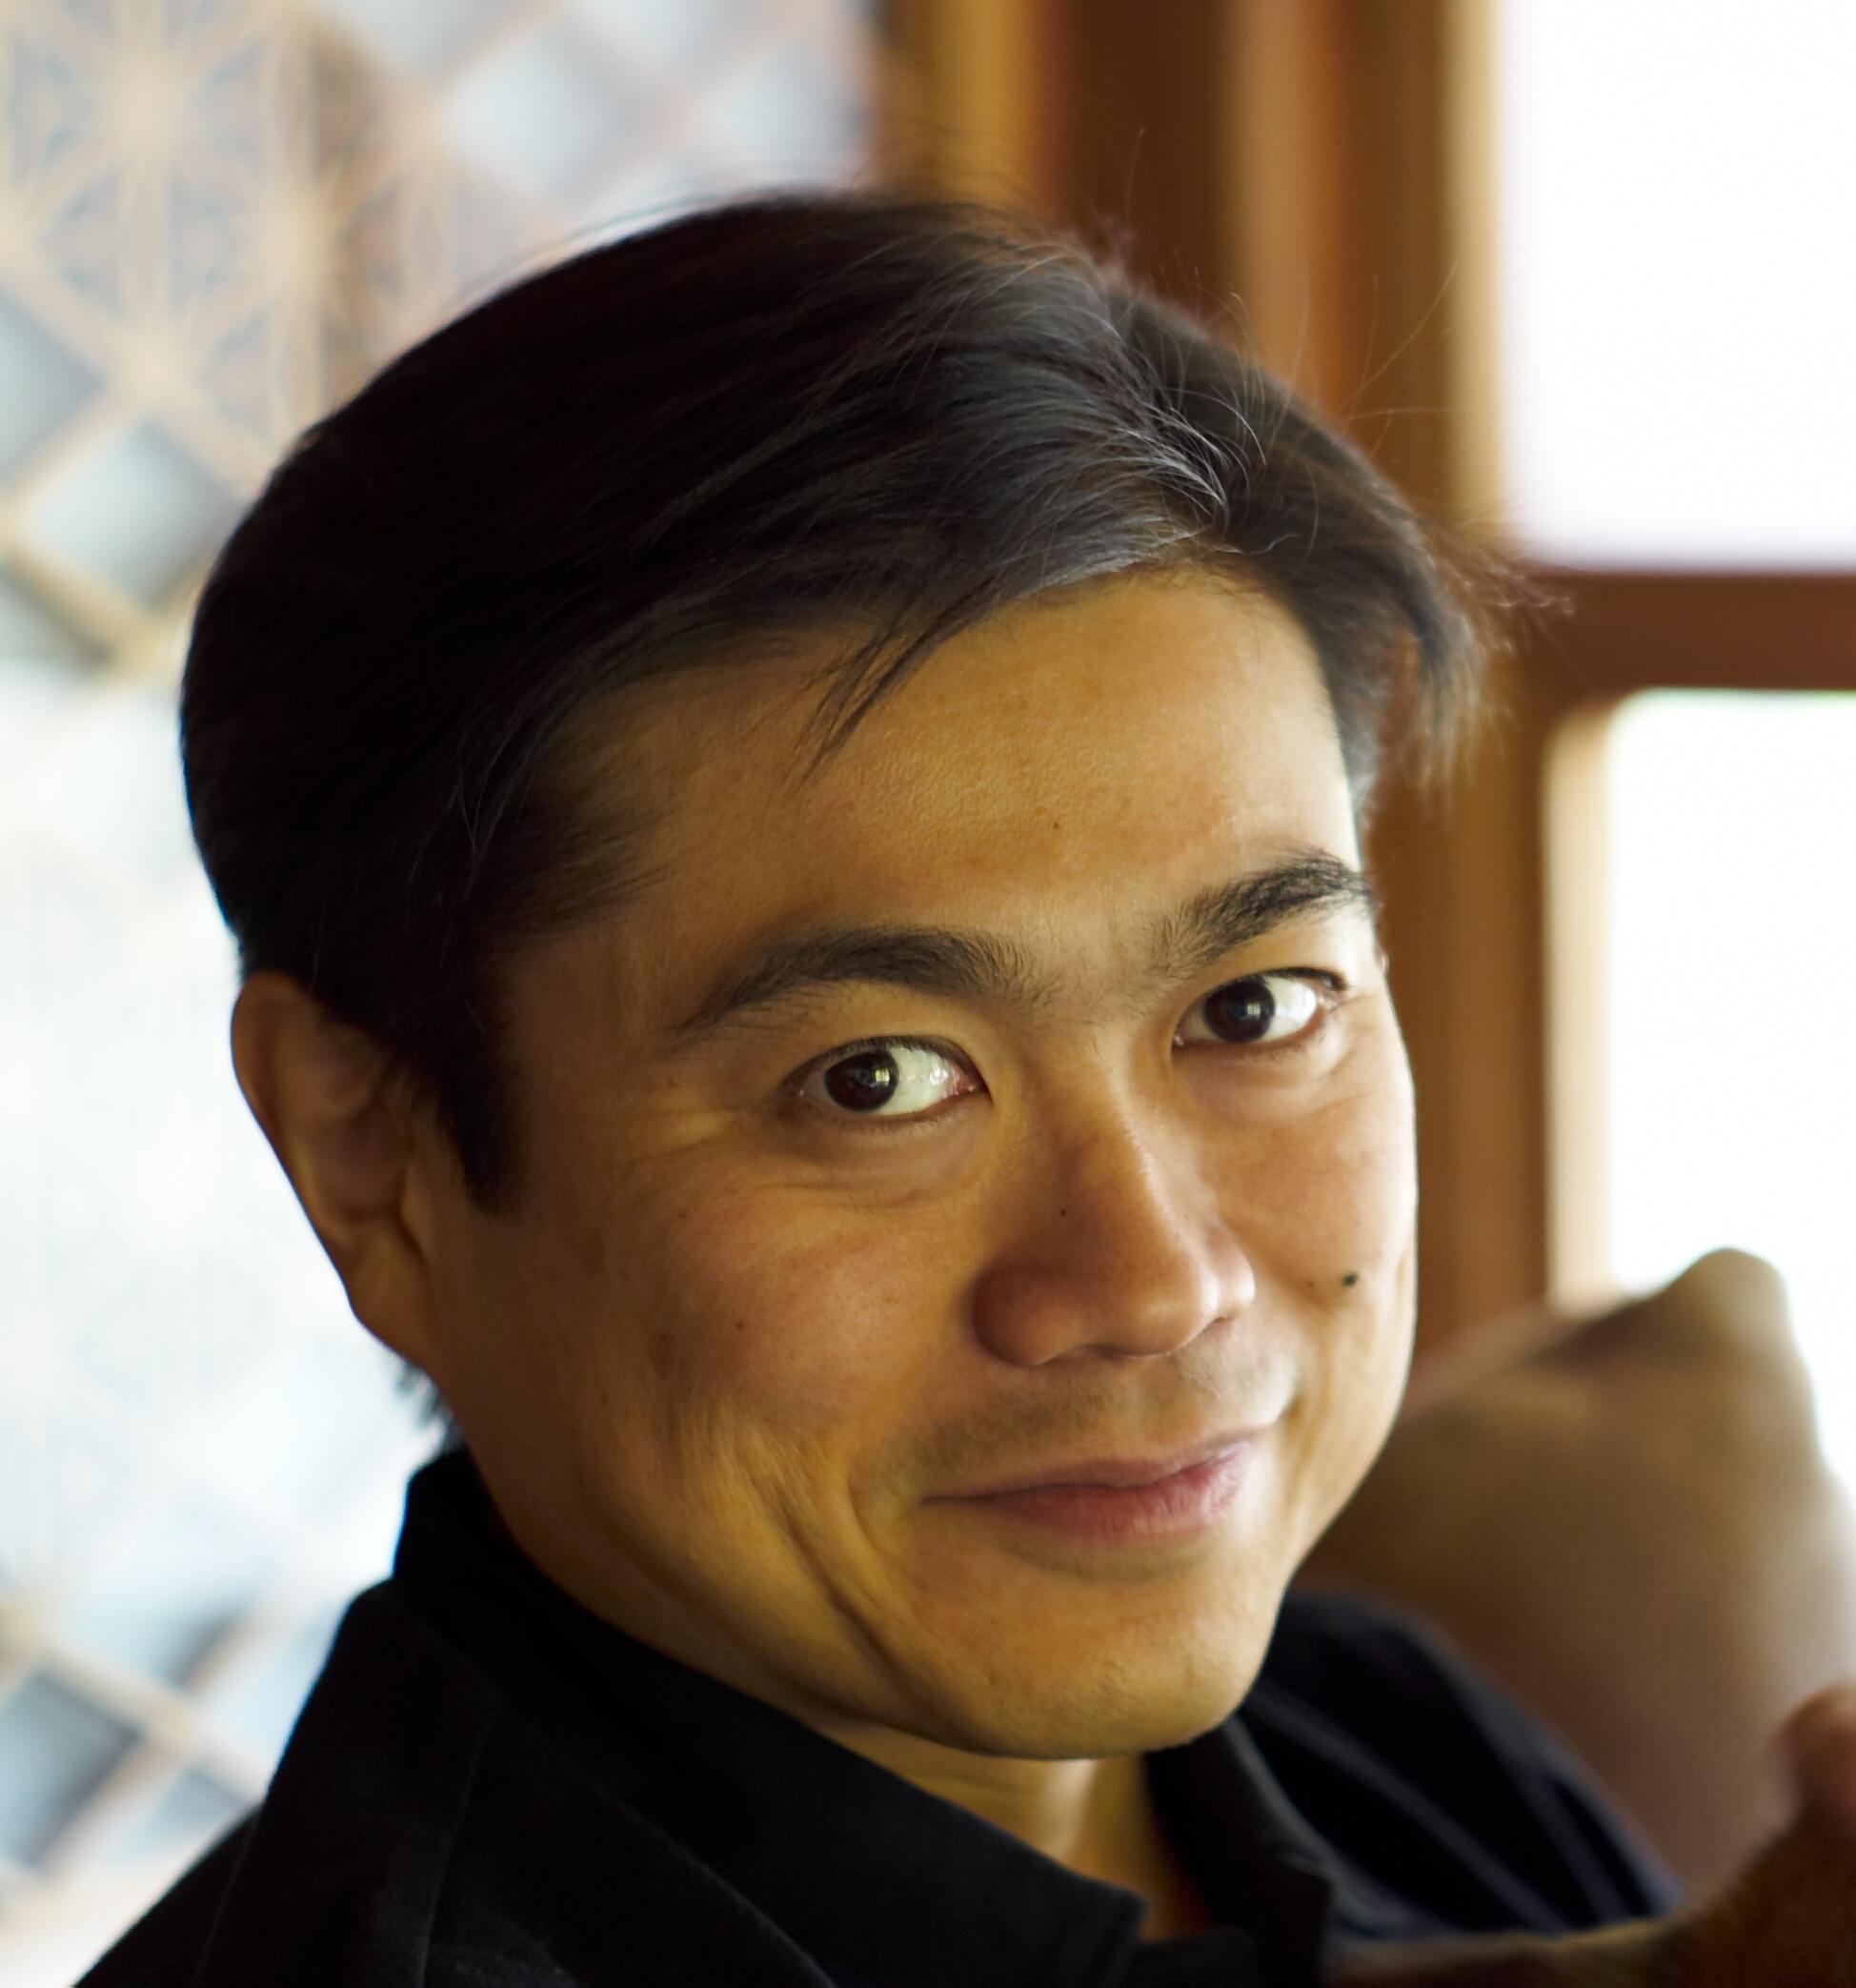 Joichi_Ito_Headshot_2007